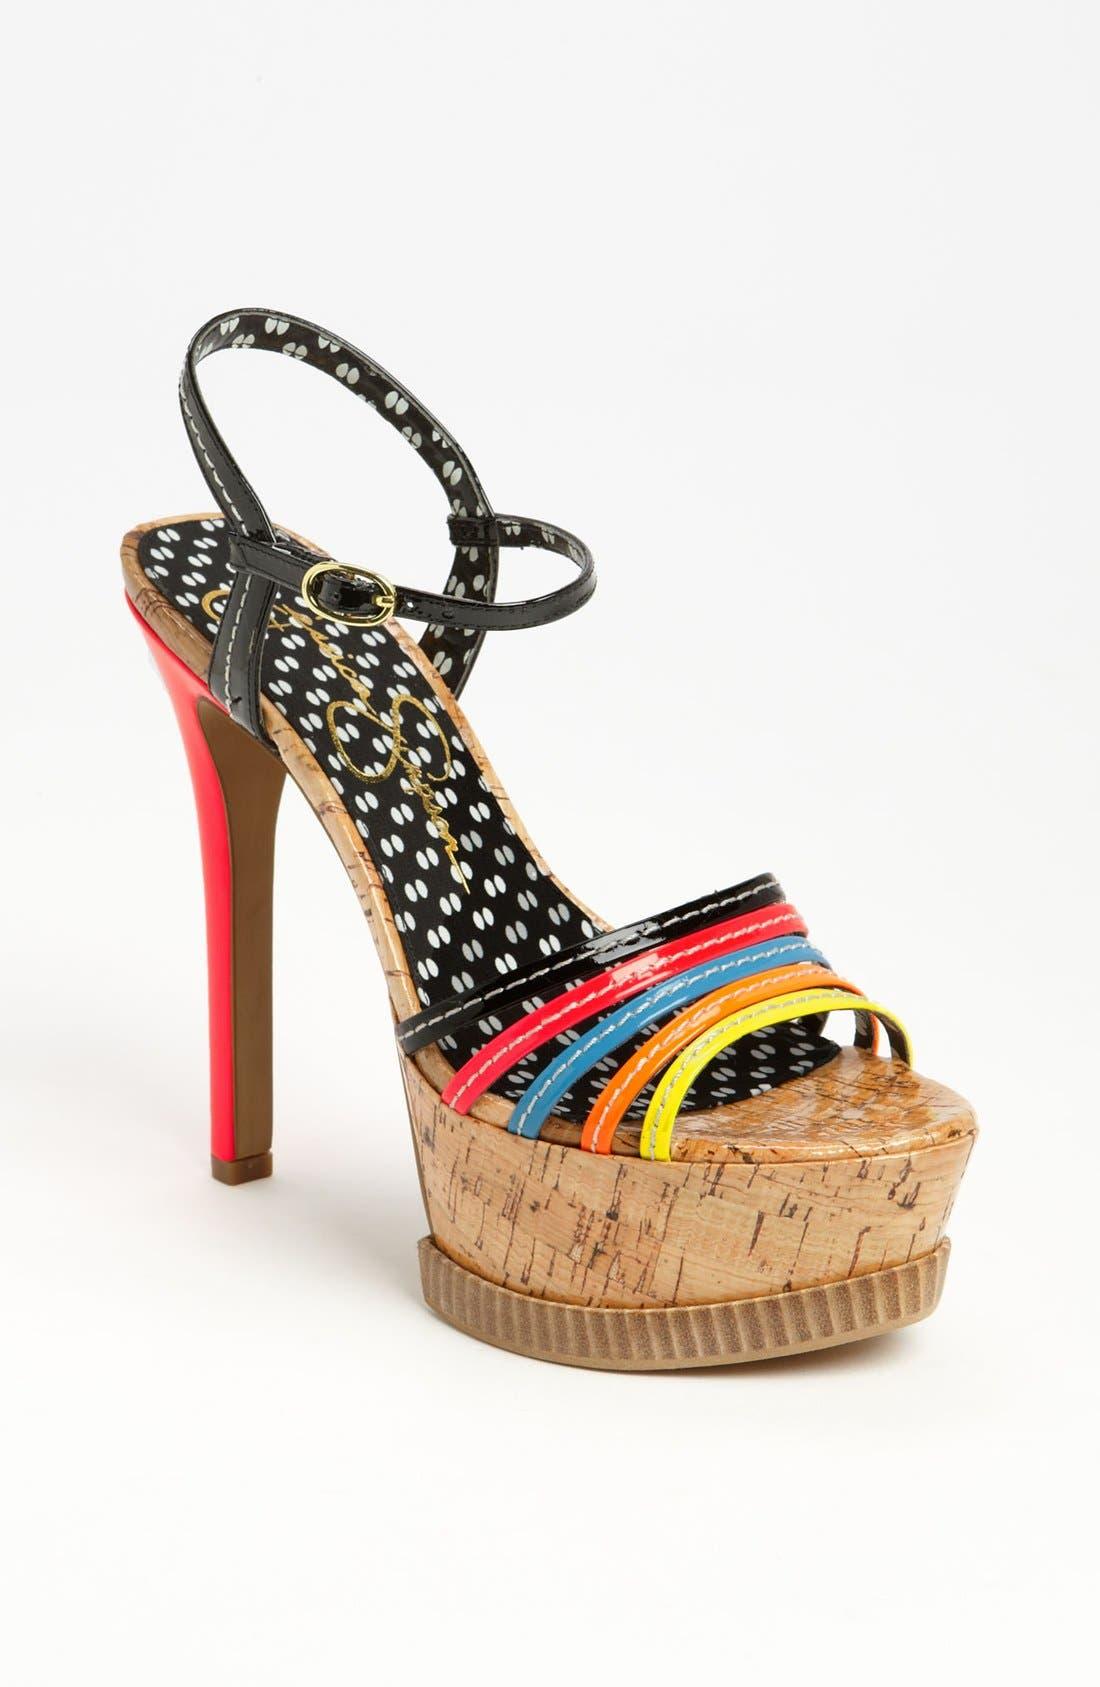 Alternate Image 1 Selected - Jessica Simpson 'Skye' Sandal